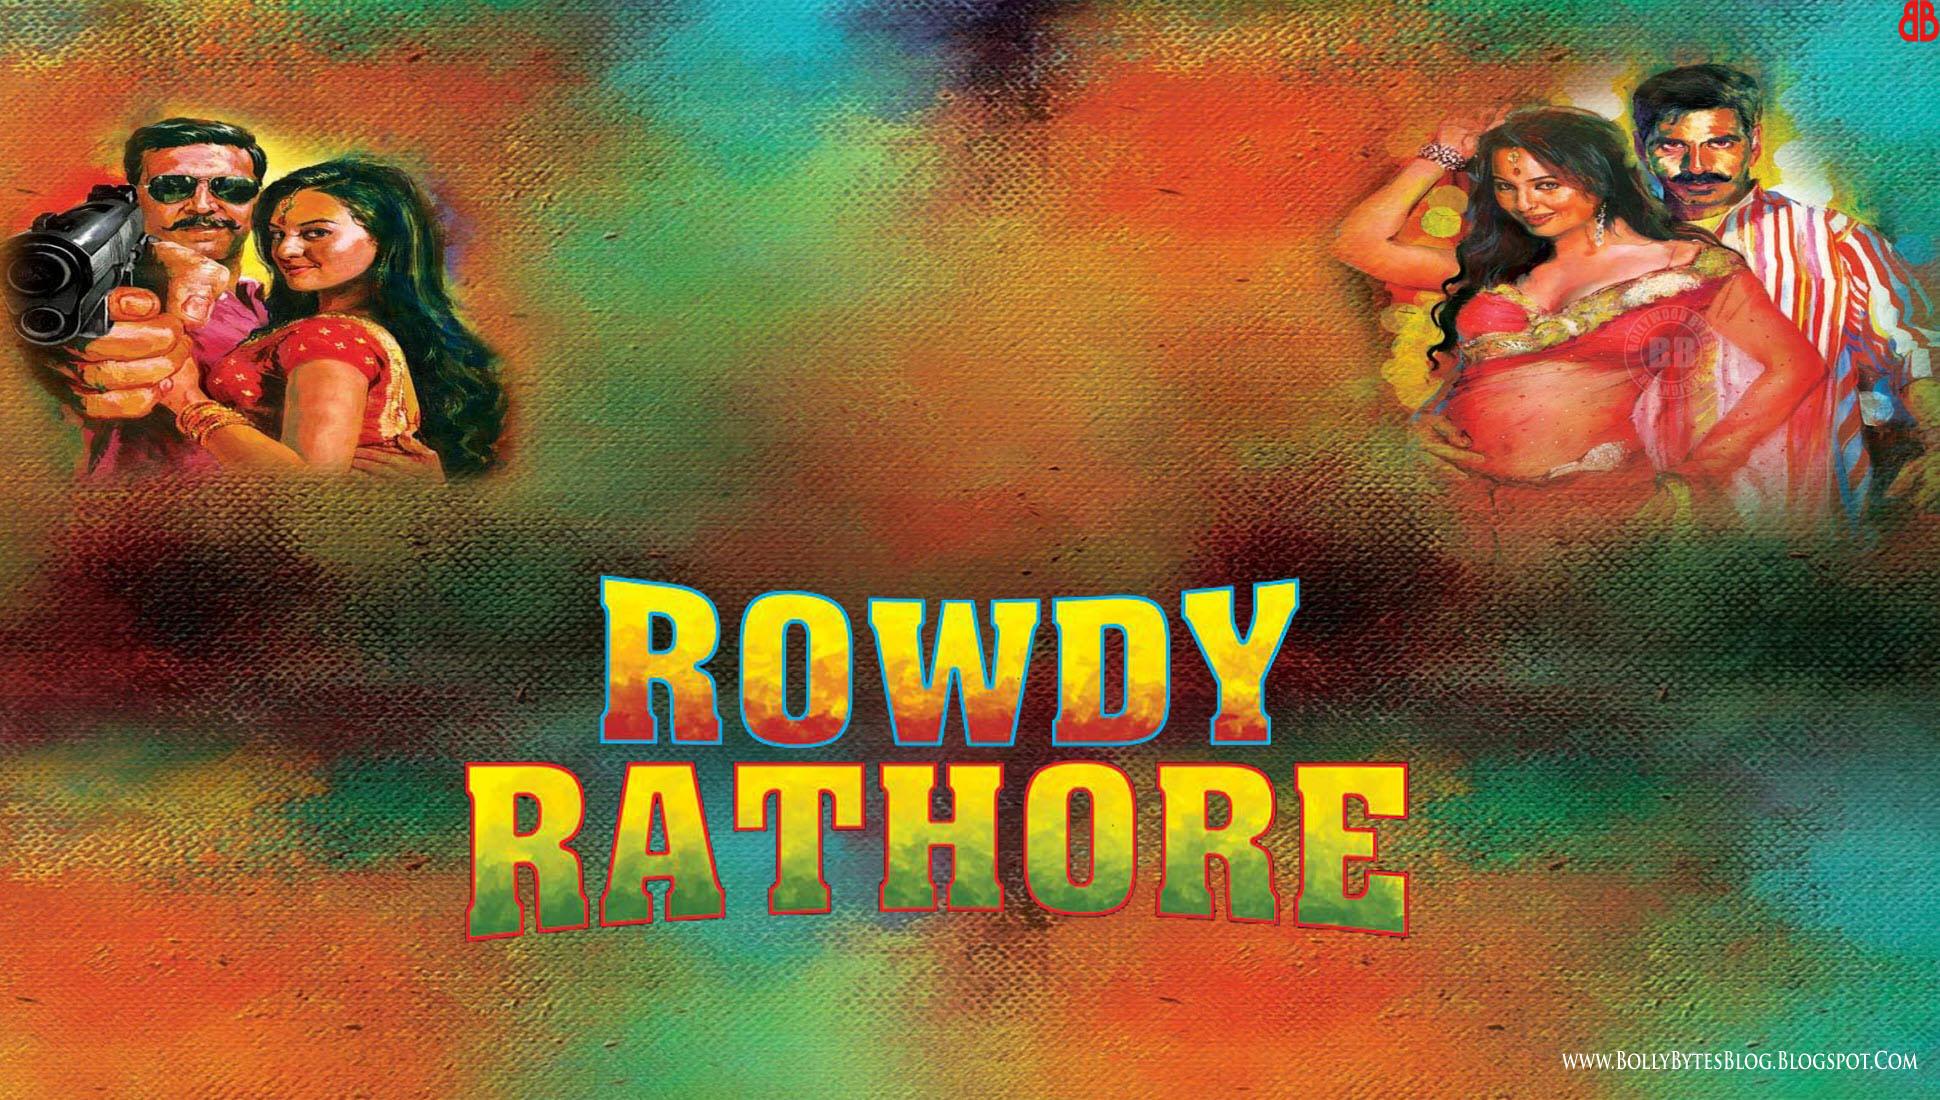 http://3.bp.blogspot.com/--8dFv-6uBnU/T5iax6hLNxI/AAAAAAAAG_M/f4BsXb6Ln5k/s1940/Rowdy-Rathore-Akshay-Kumar-a-Sonakshi-Sinha-HQ-Wallpapers-06.jpg